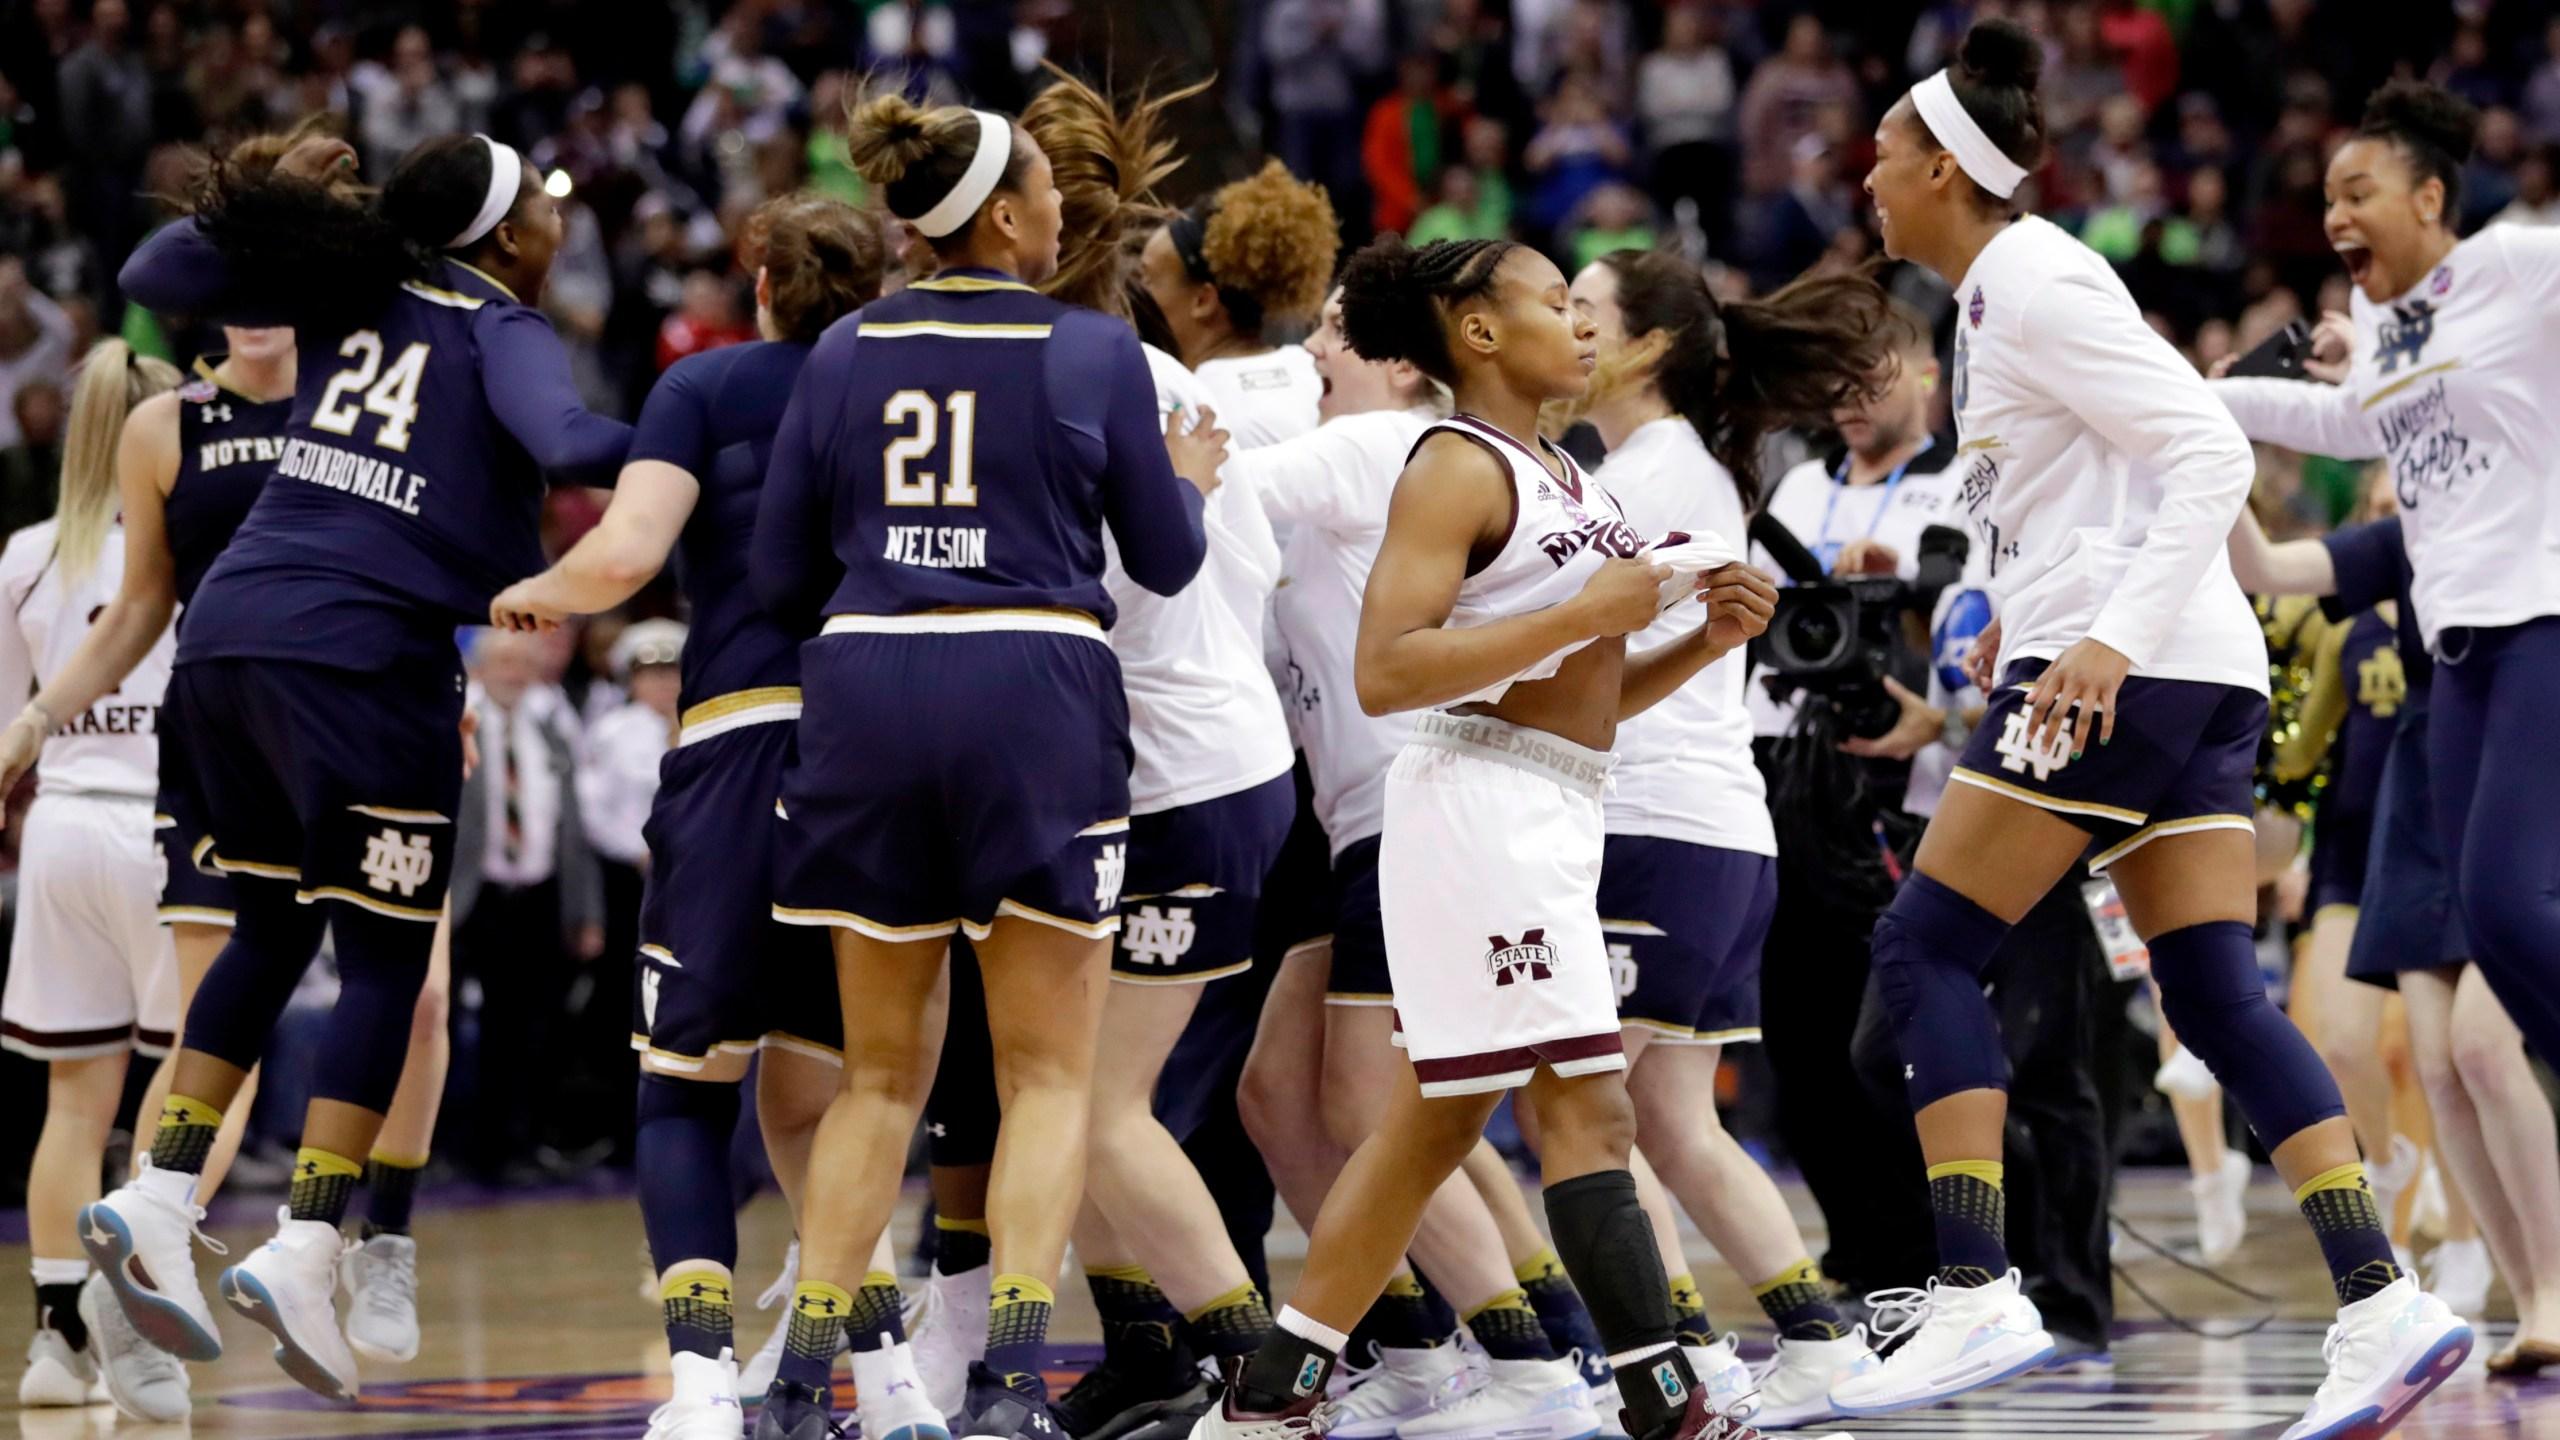 NCAA_Championship_Notre_Dame_Mississippi_St_Basketball_44559-159532.jpg79548865